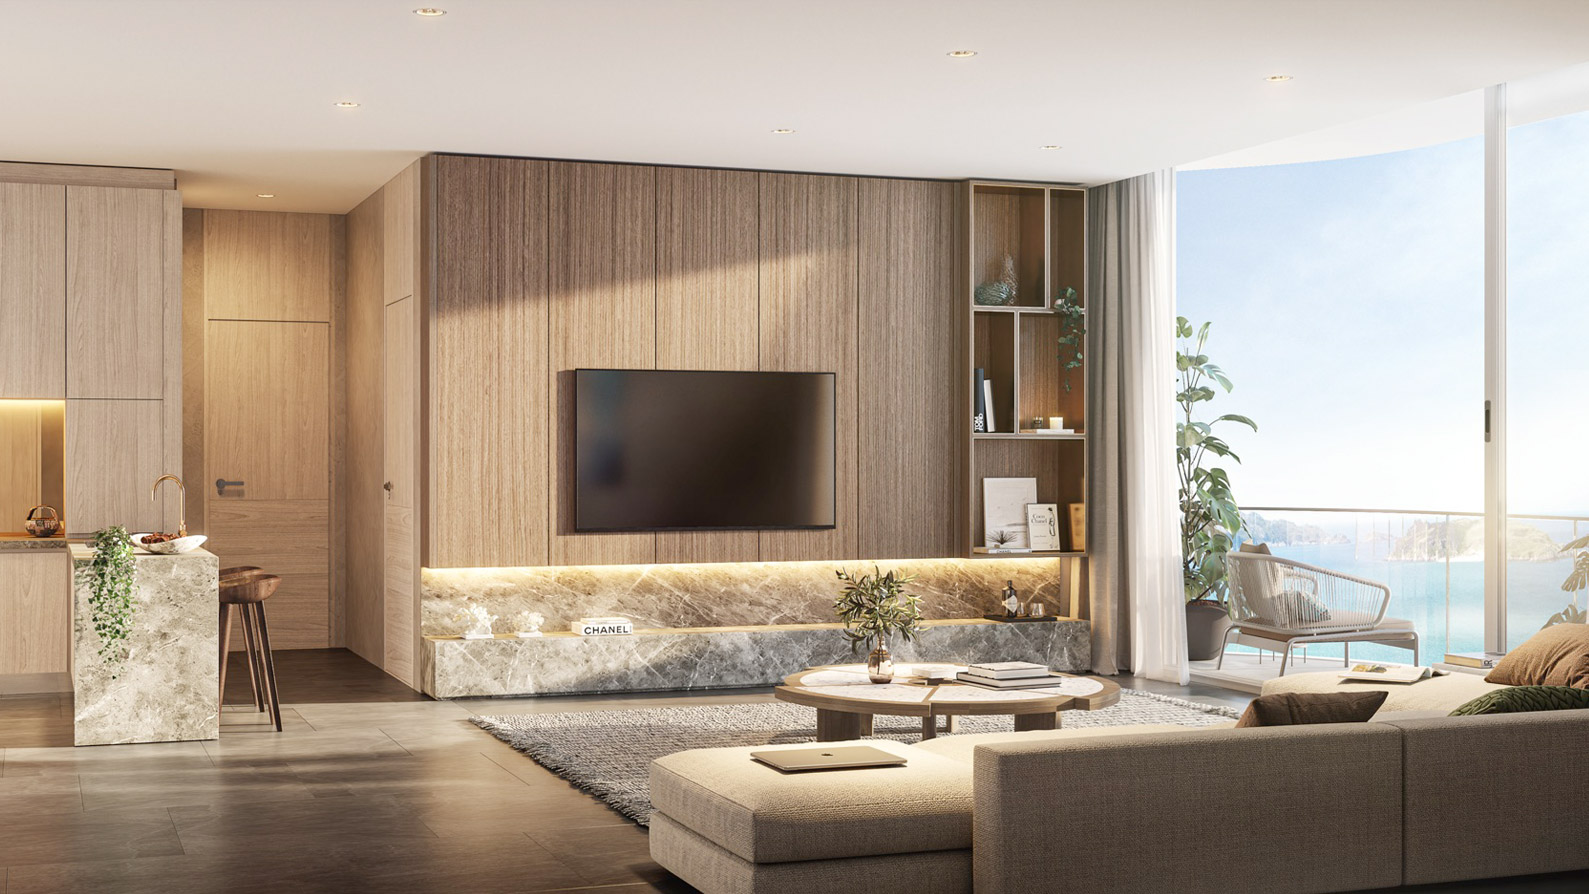 The Aston Luxury Residence